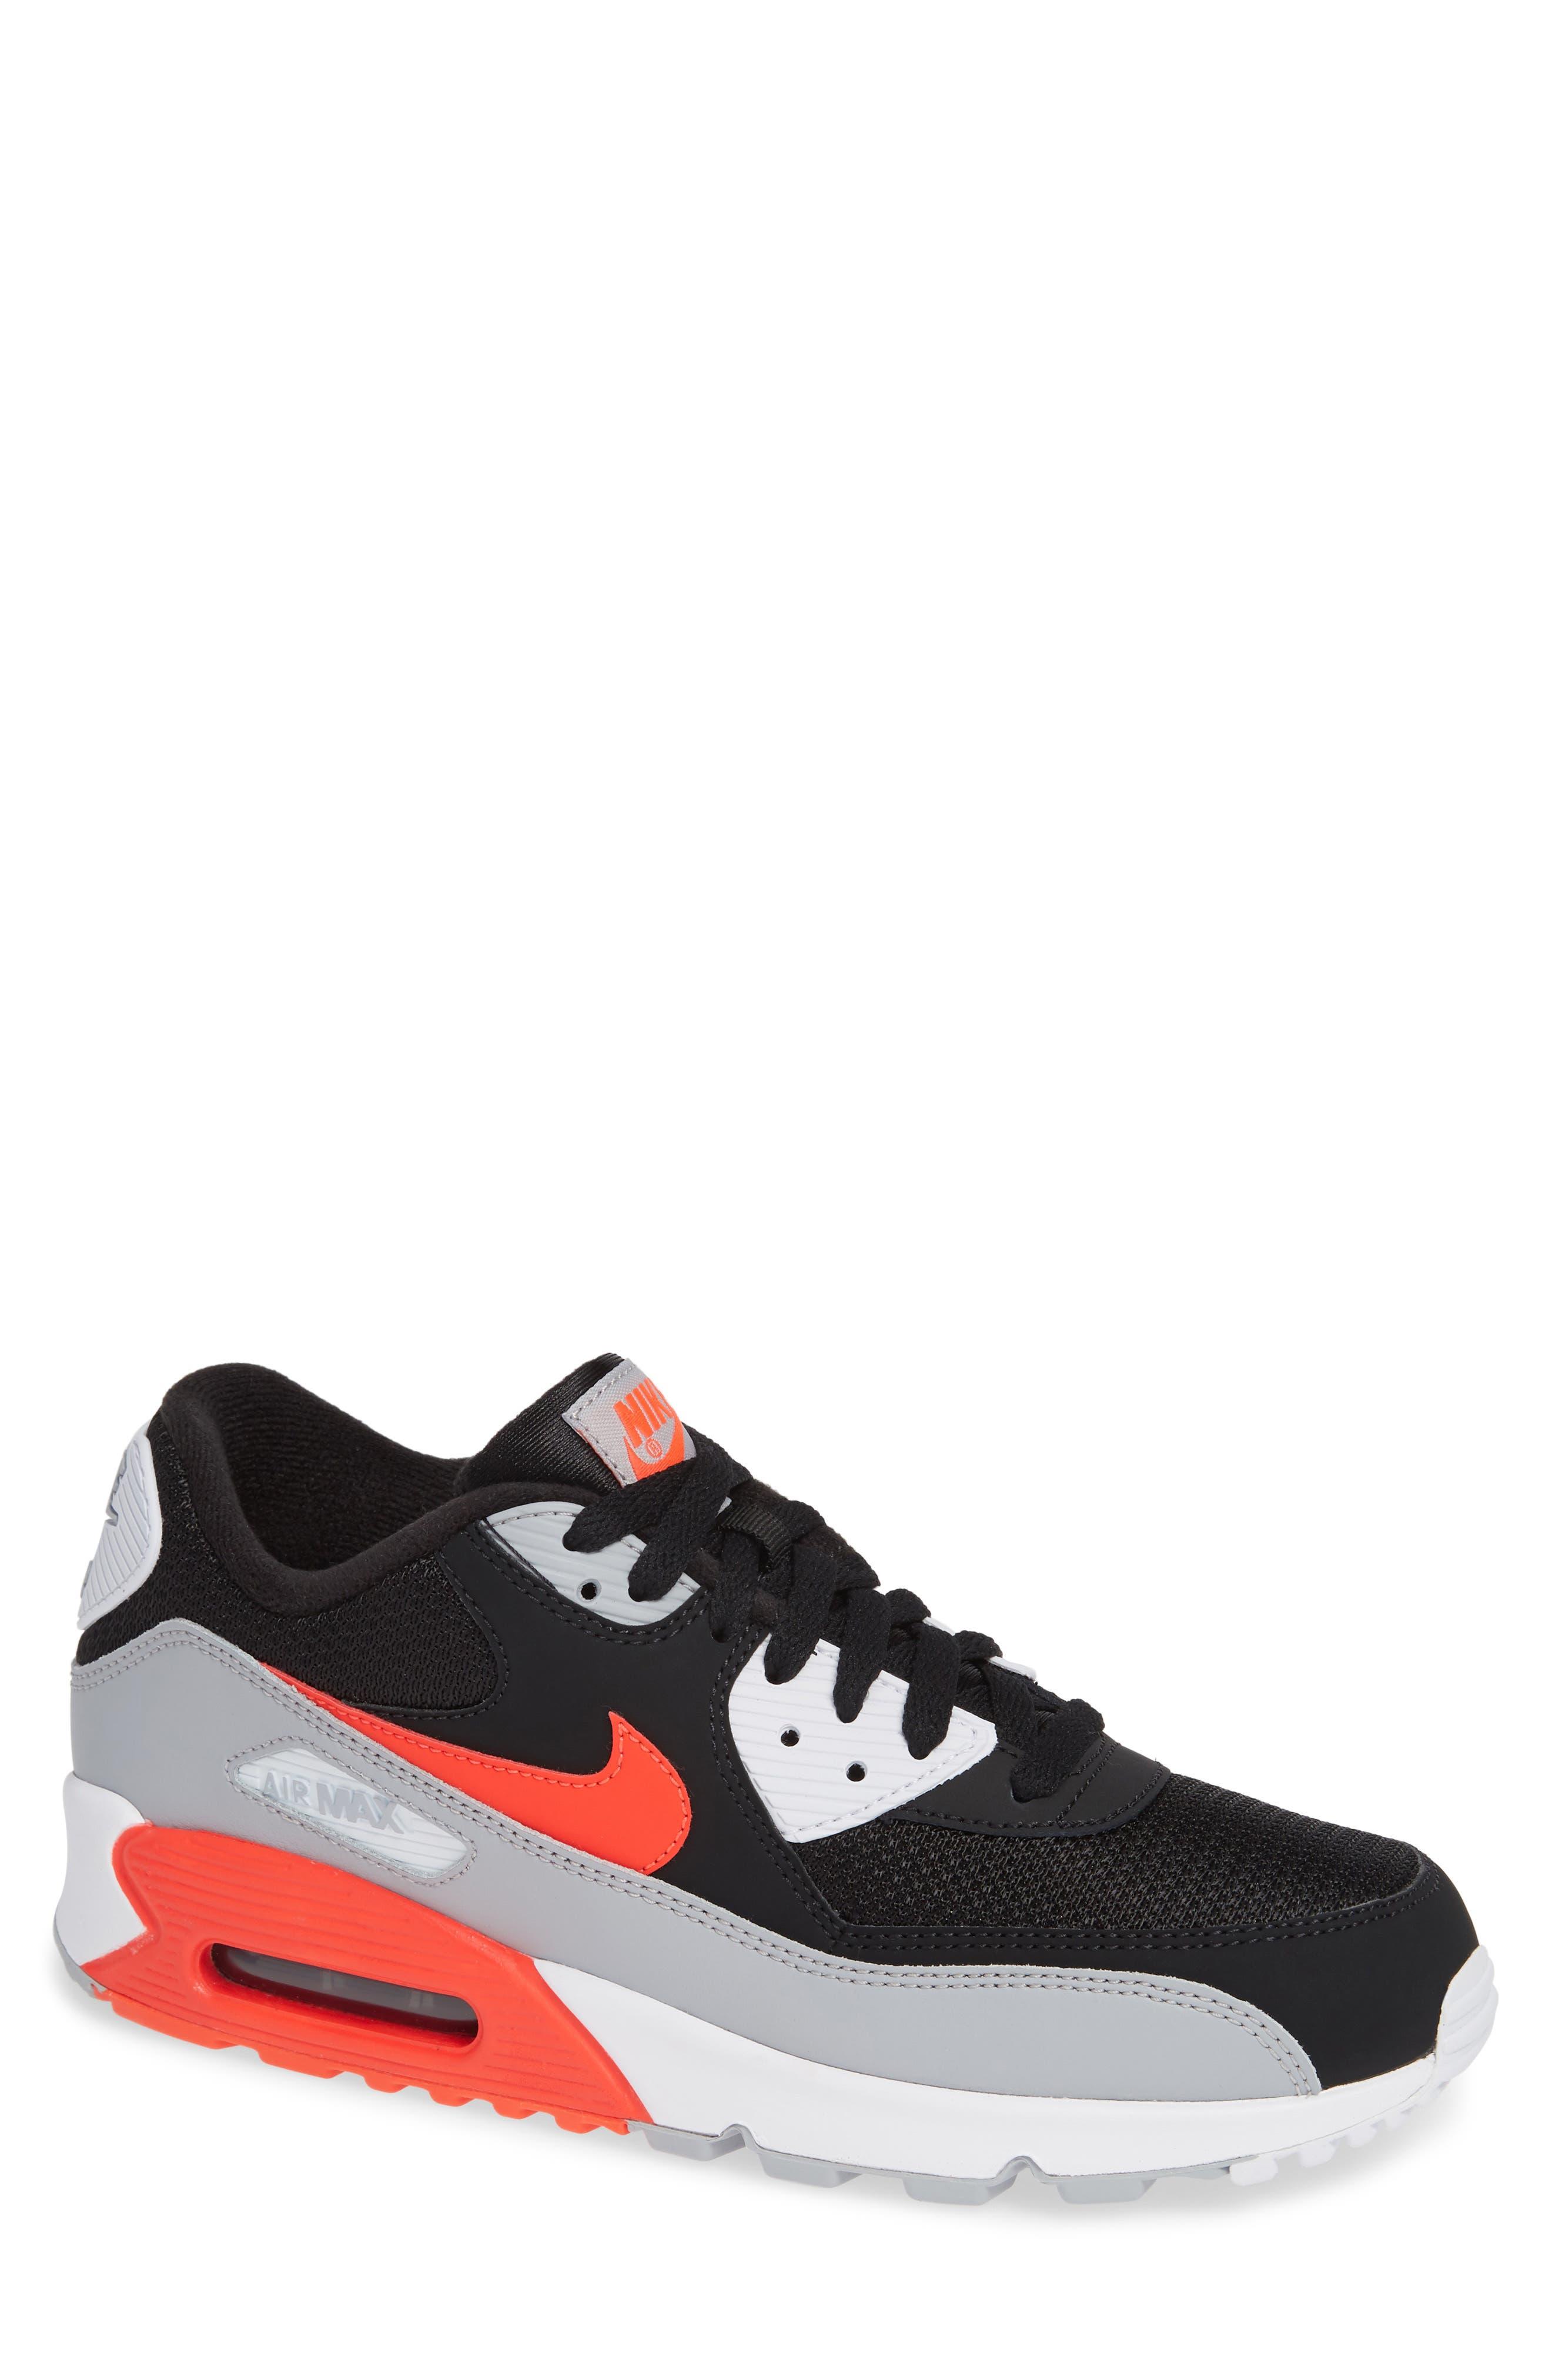 Air Max 90 Essential Sneaker,                             Main thumbnail 1, color,                             WOLF GREY/ CRIMSON/ BLACK